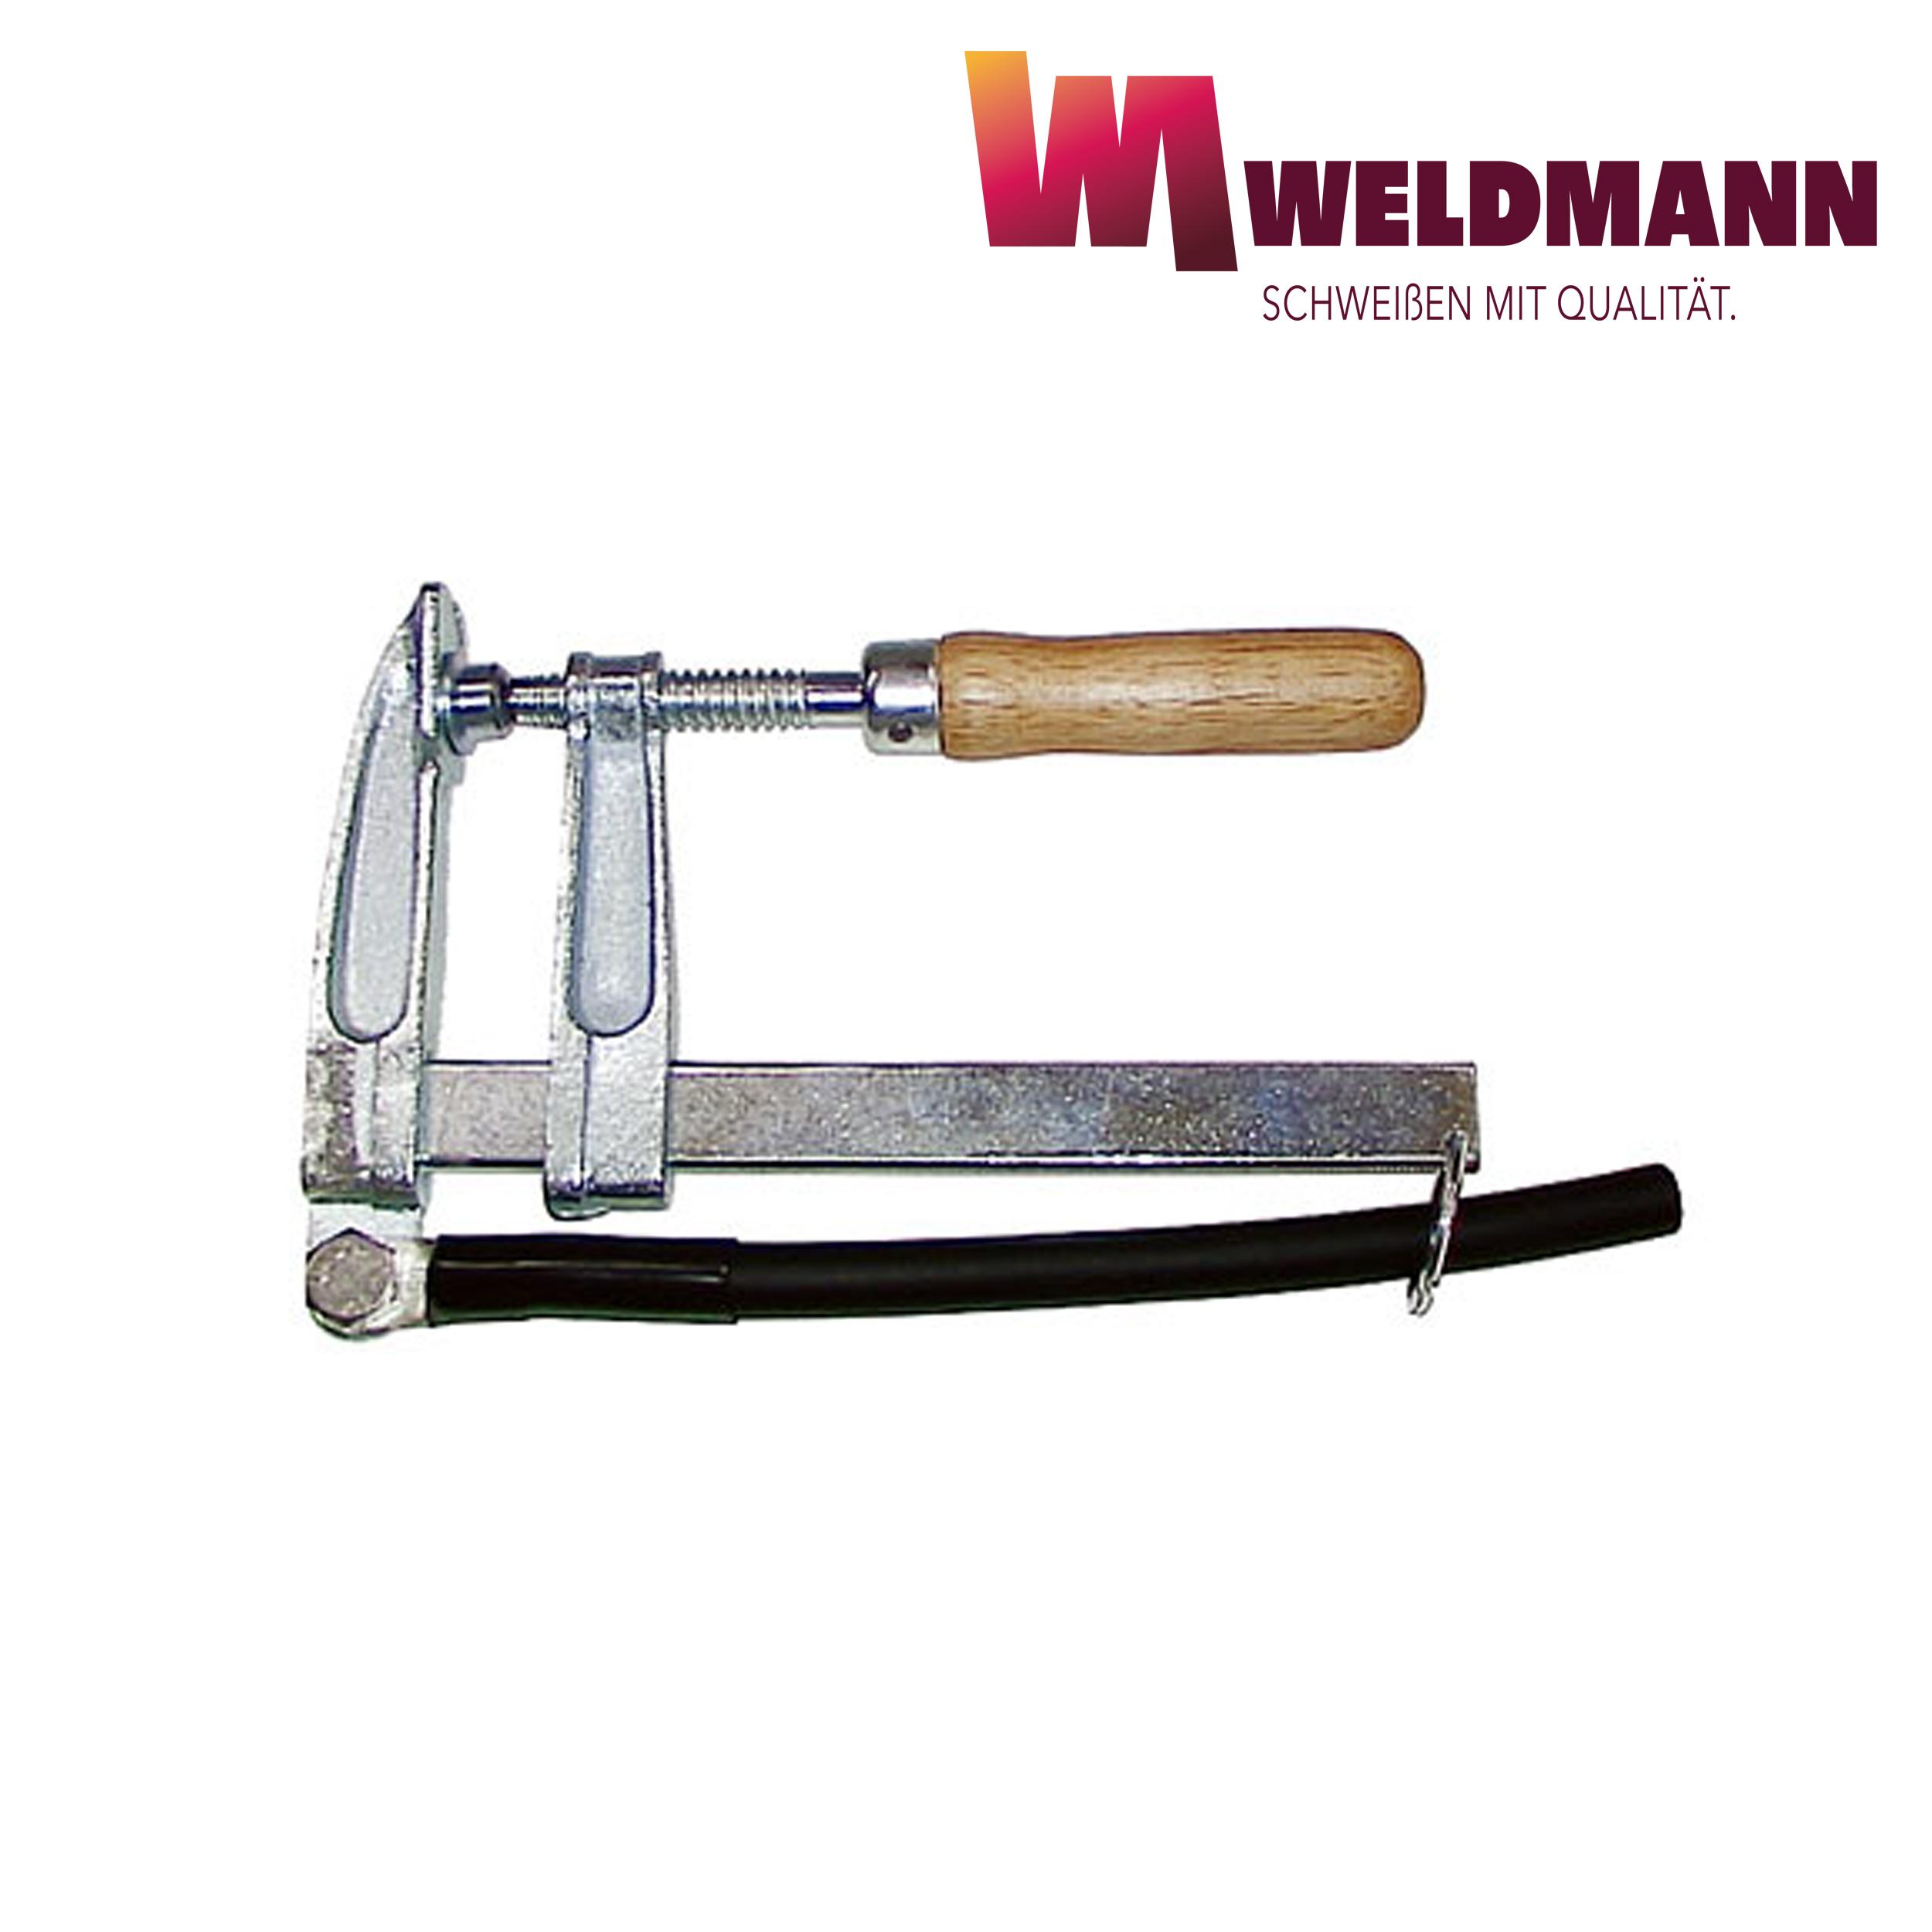 Polzwinge mit Holzgriff, 400 A